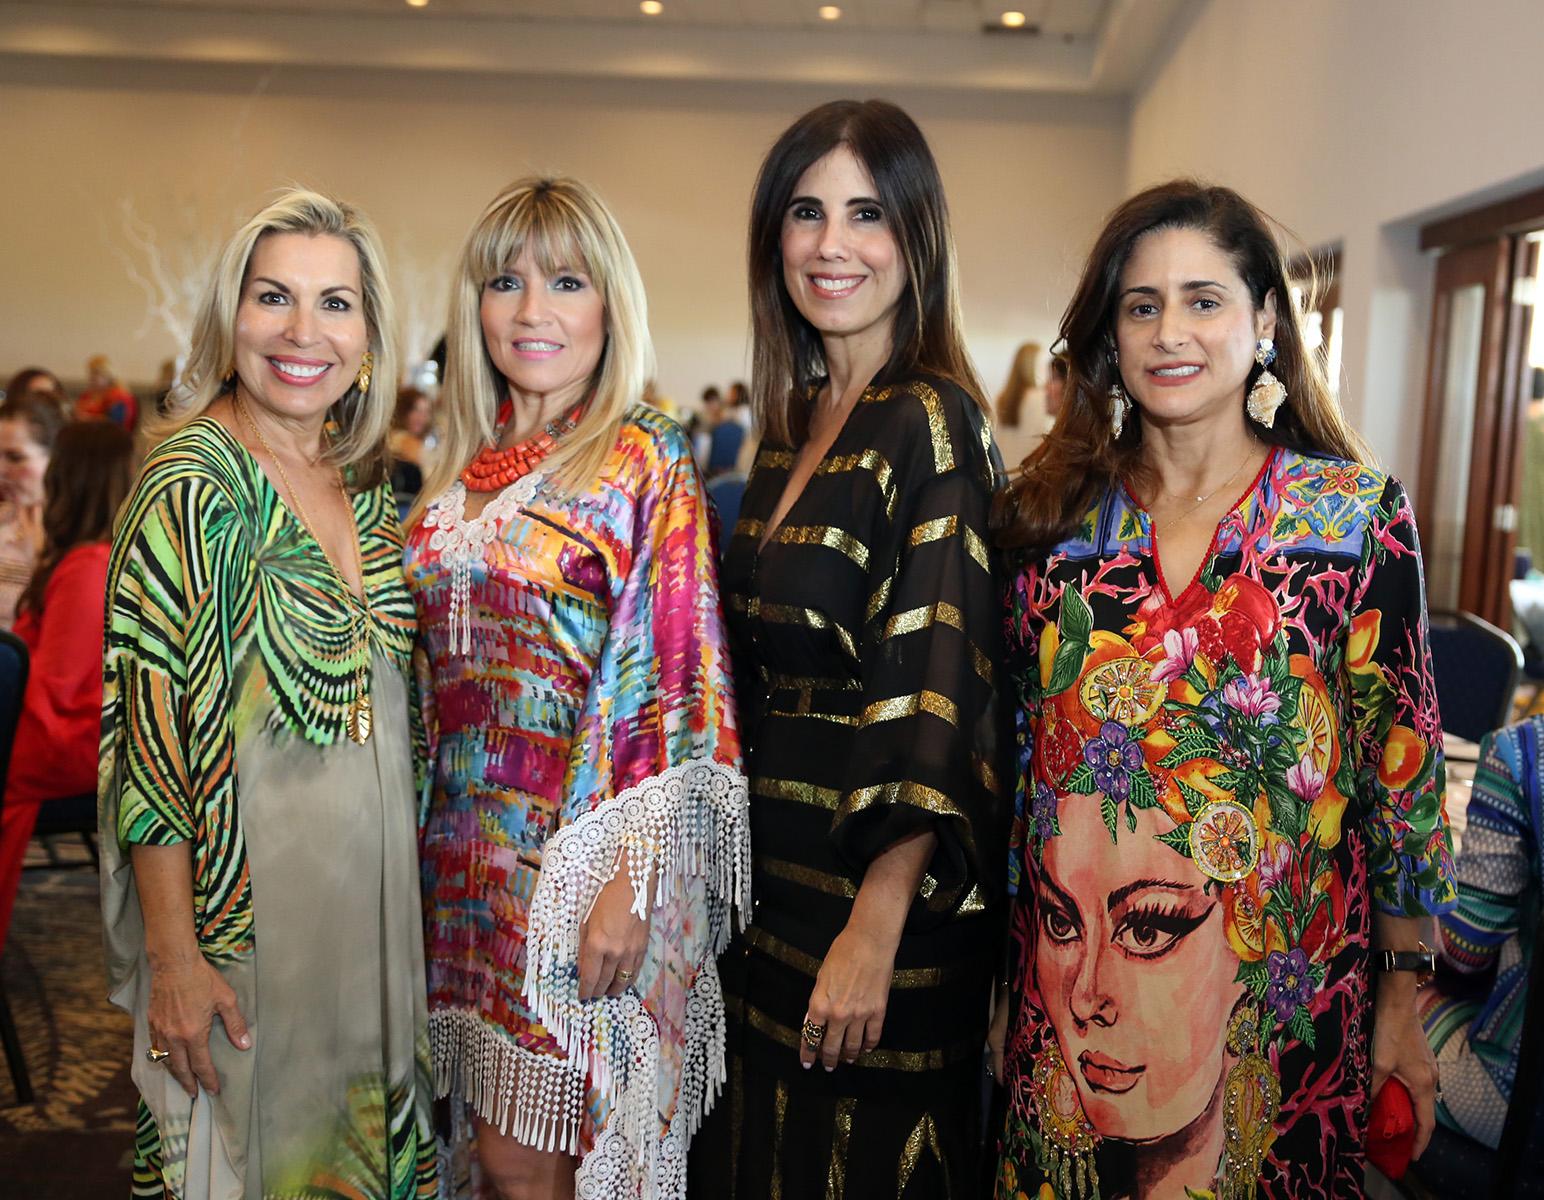 Gabriela Ballester, Mari Carmen Aguayo, Ana Casas y Maresa del Toro. Fotos José Rafael Pérez Centeno